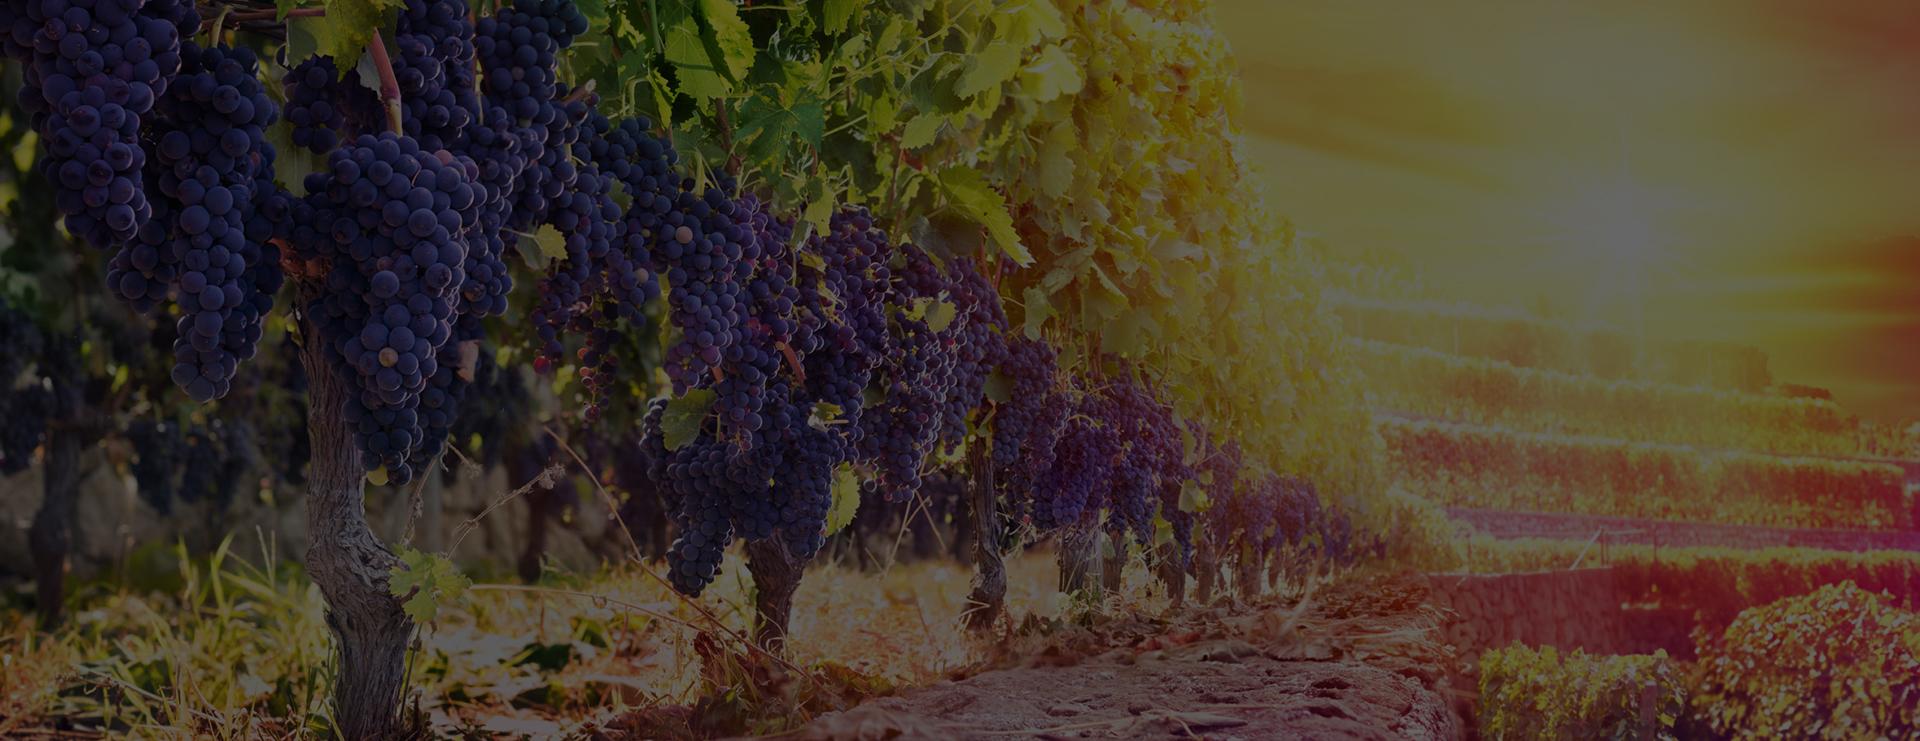 cudze chwalicie winnice